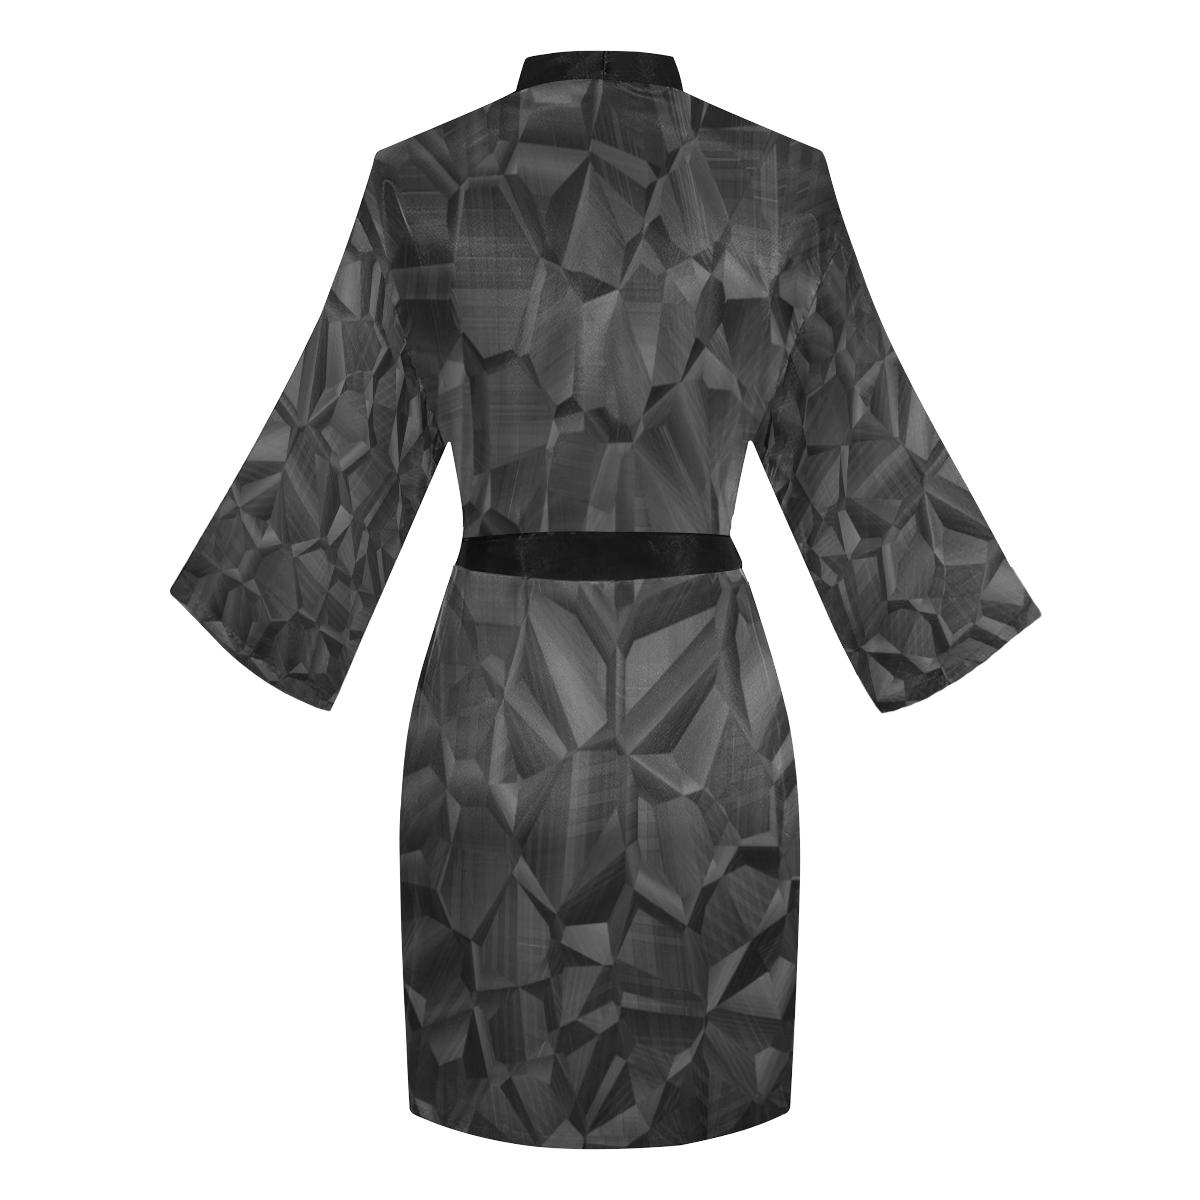 Black Satin Long Sleeve Kimono Robe